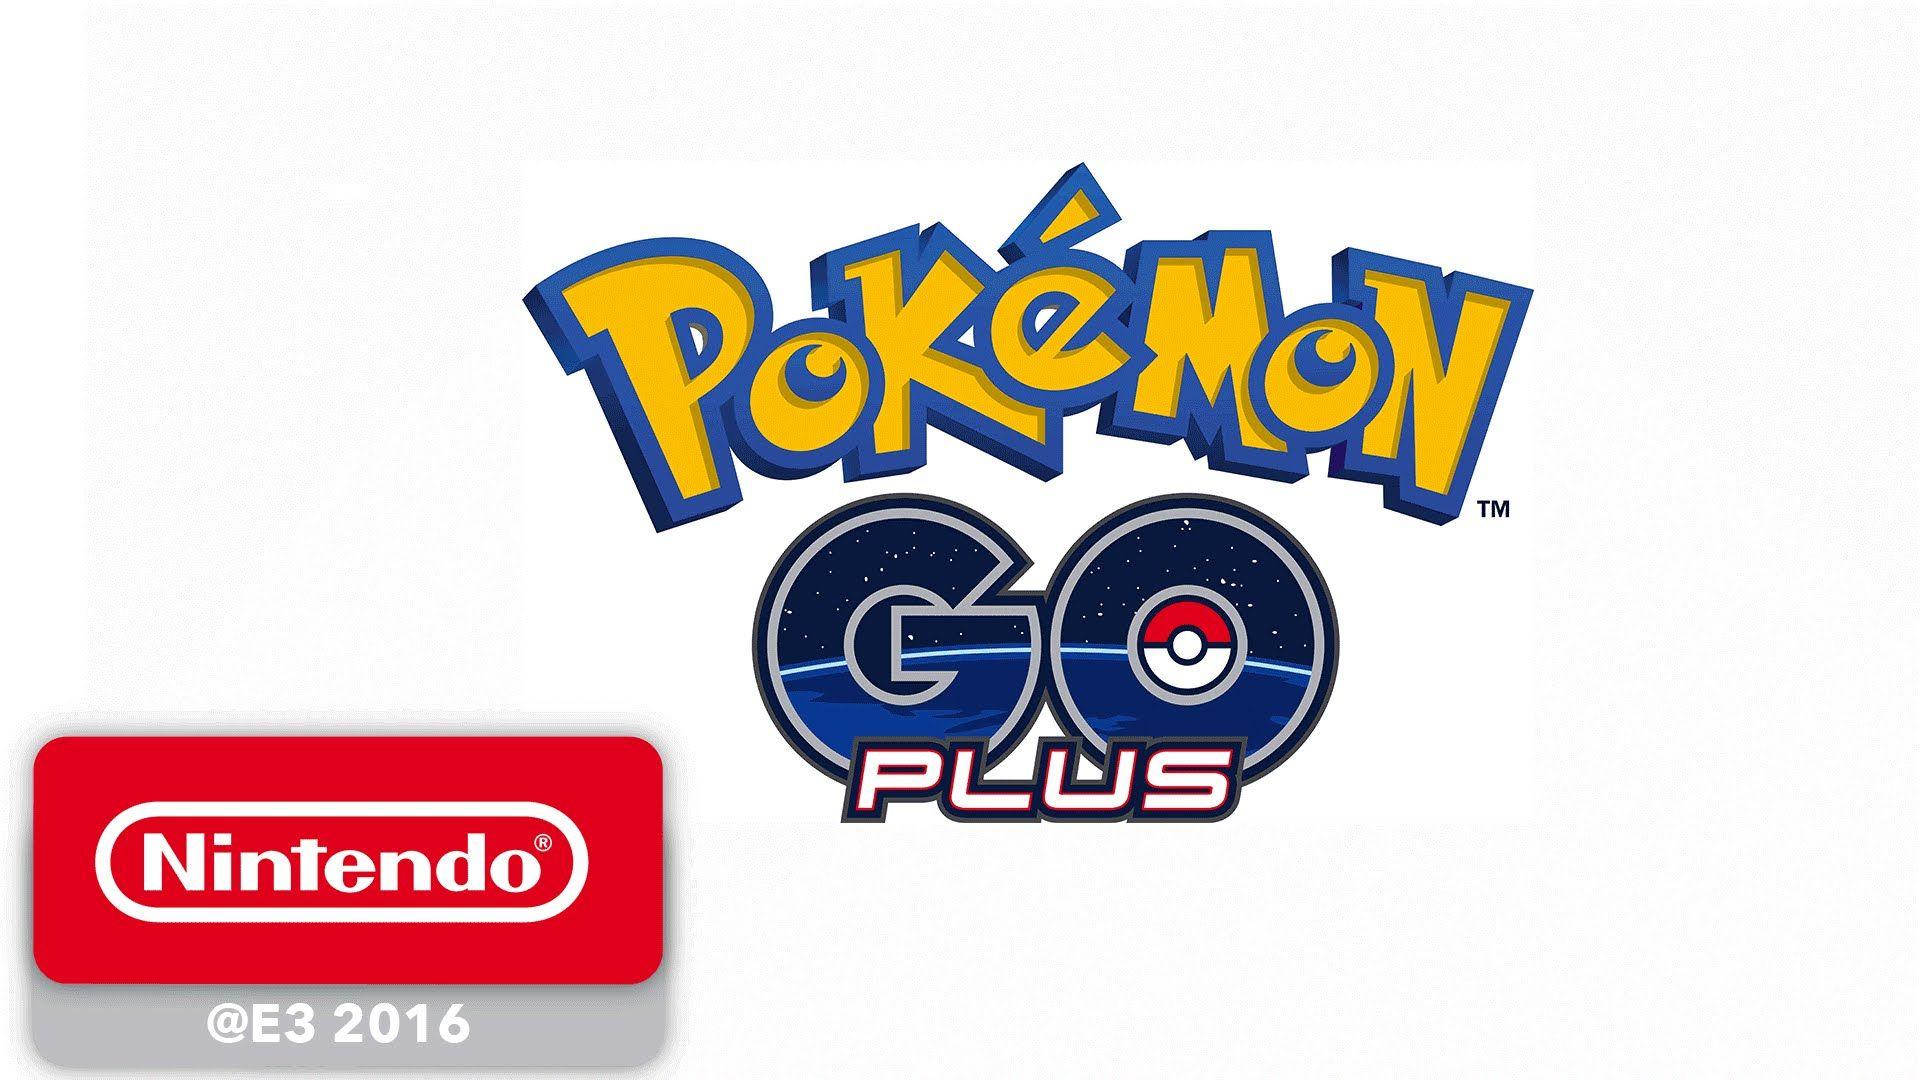 Pokémon GO Demonstration Nintendo E3 2016 Pokémon